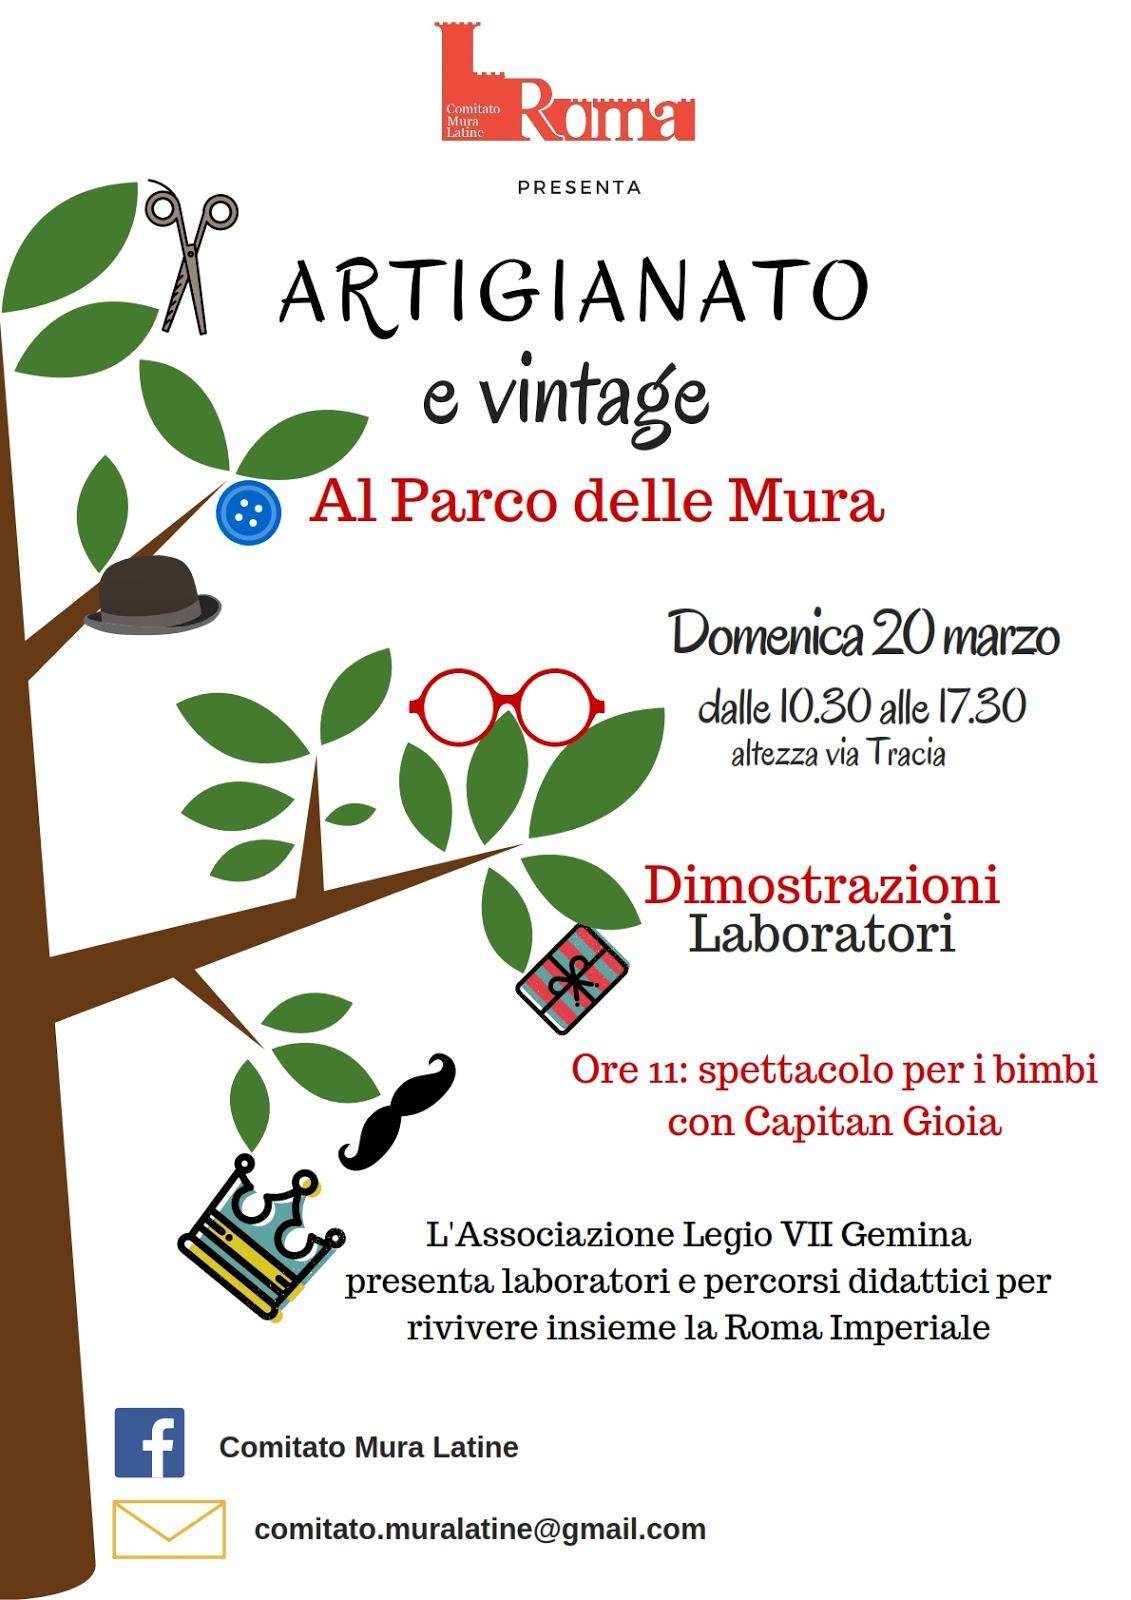 Artigiani e vintage comitato mura latine for Rivista casalinga per artigiani